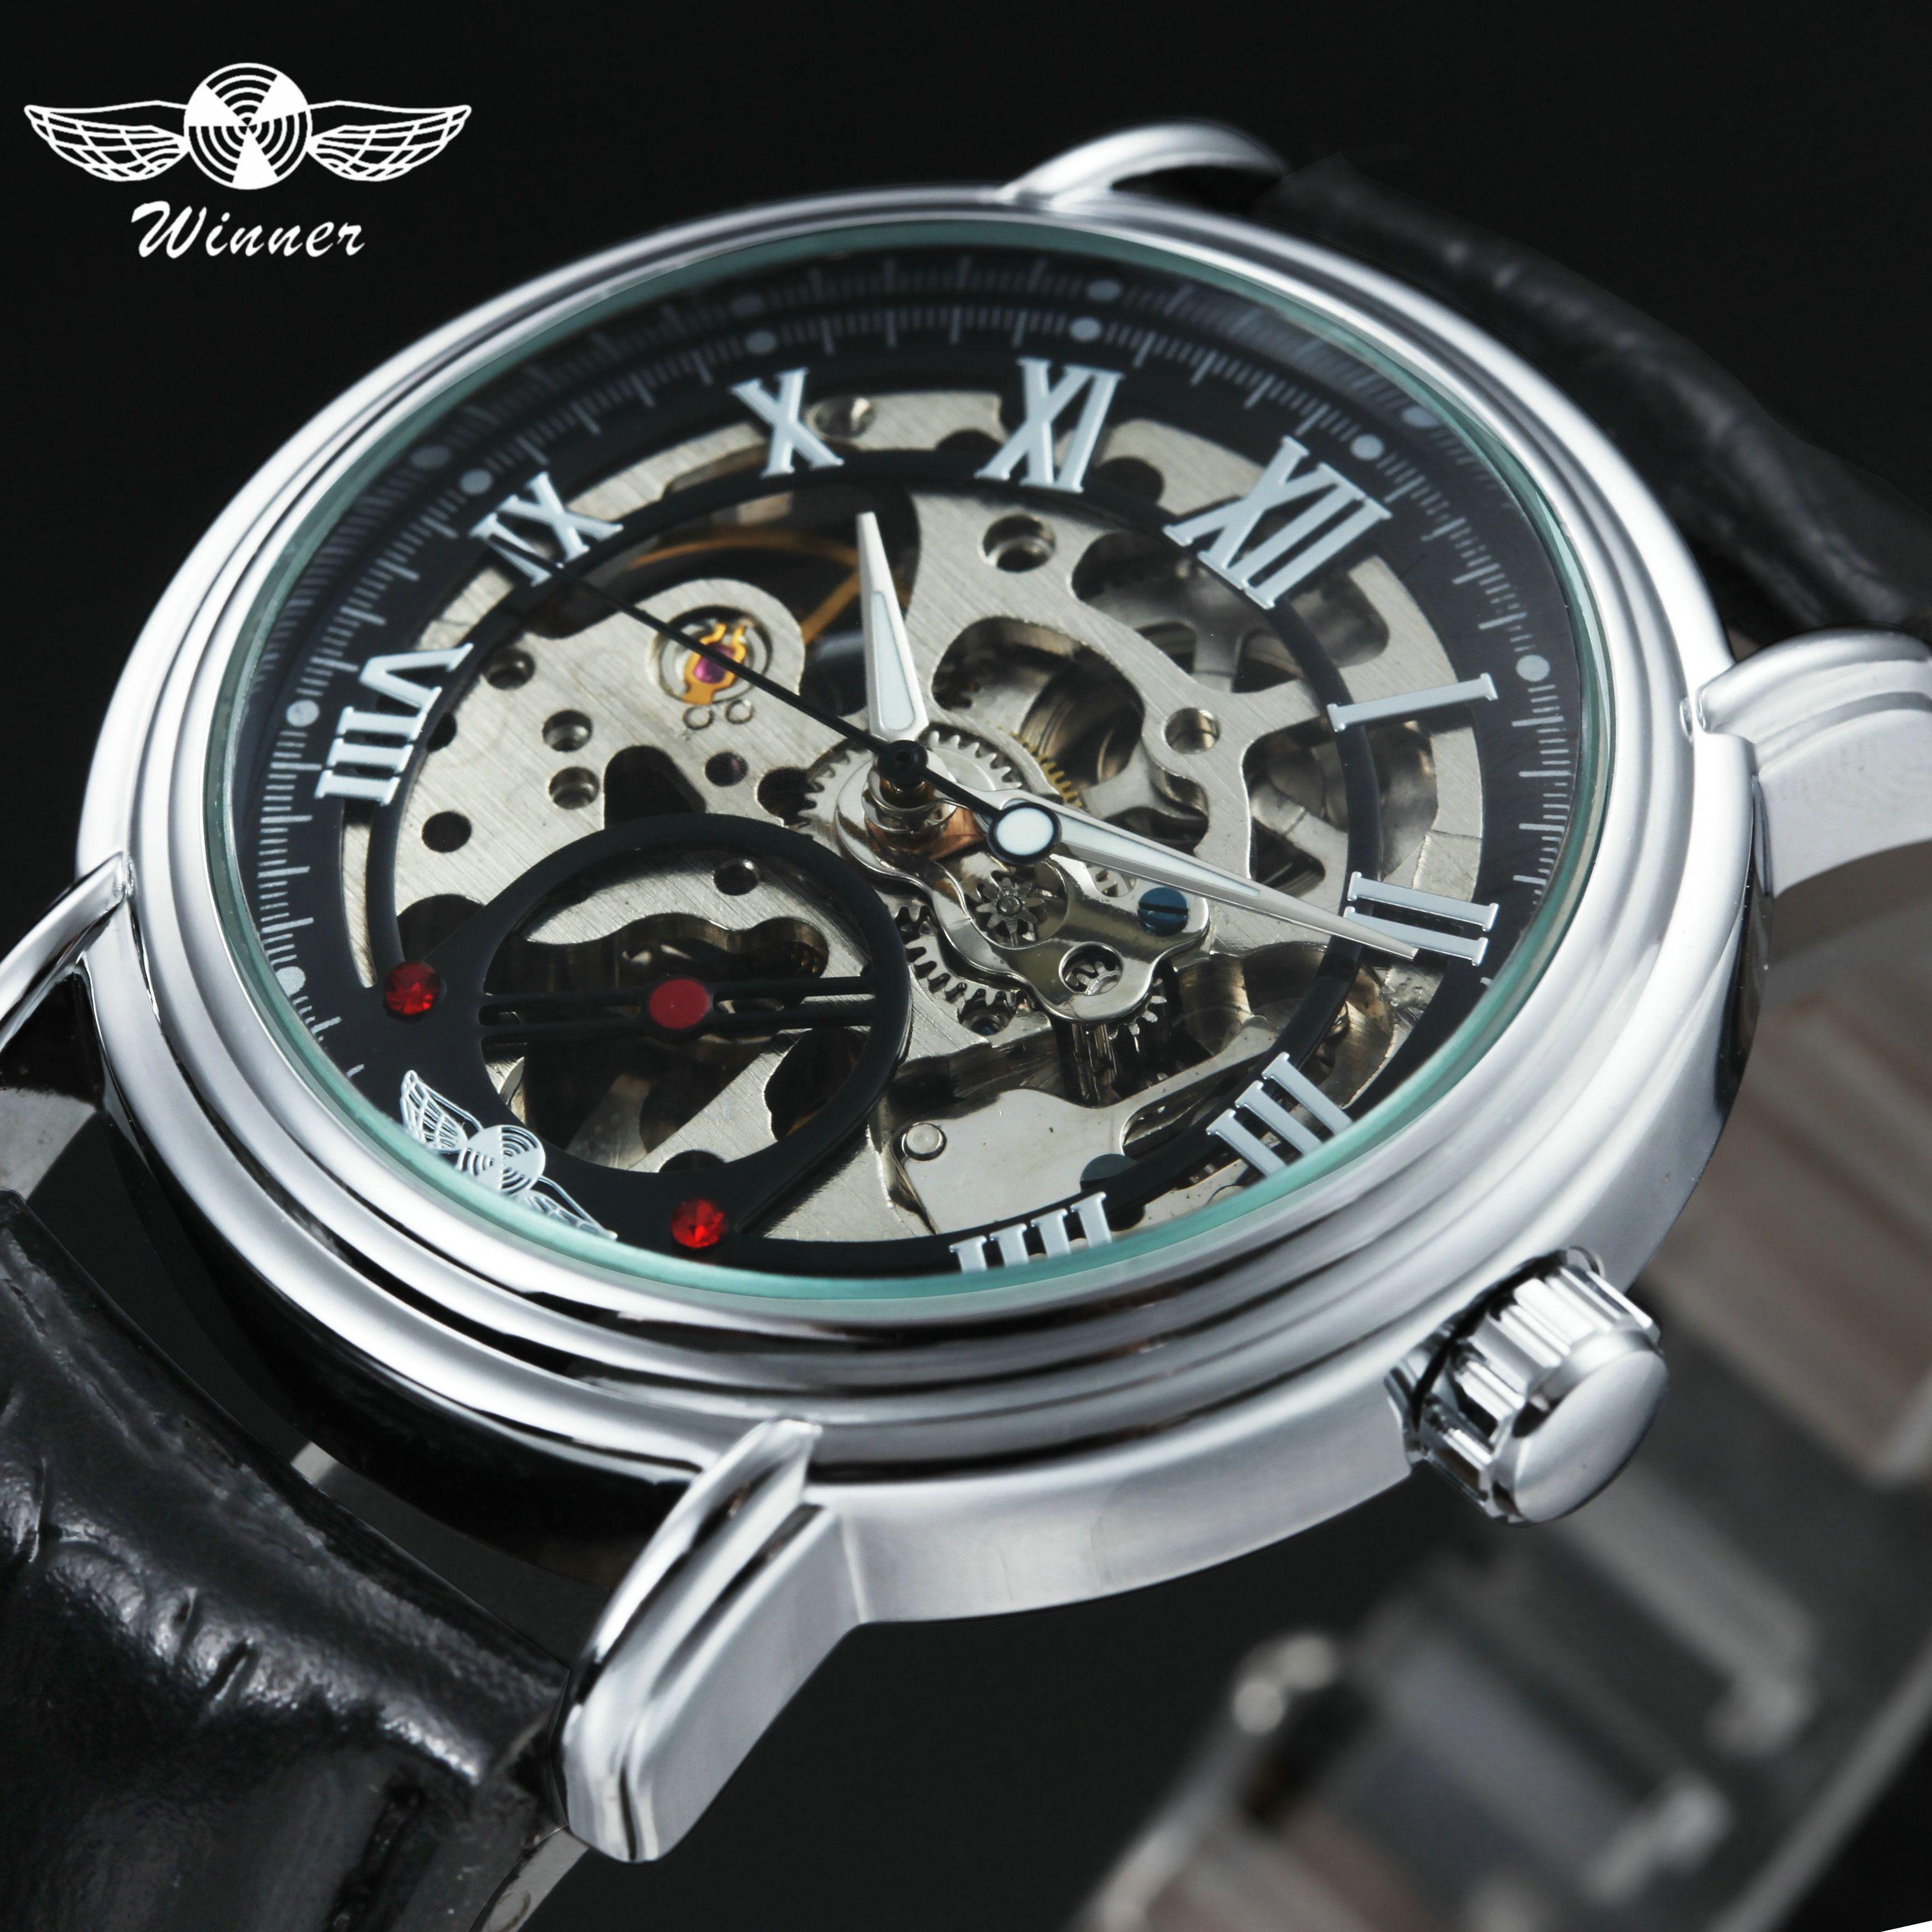 eddef5e1fb2 WINNER Classic Skeleton Auto Mechanical Watch Men Leather Strap ...